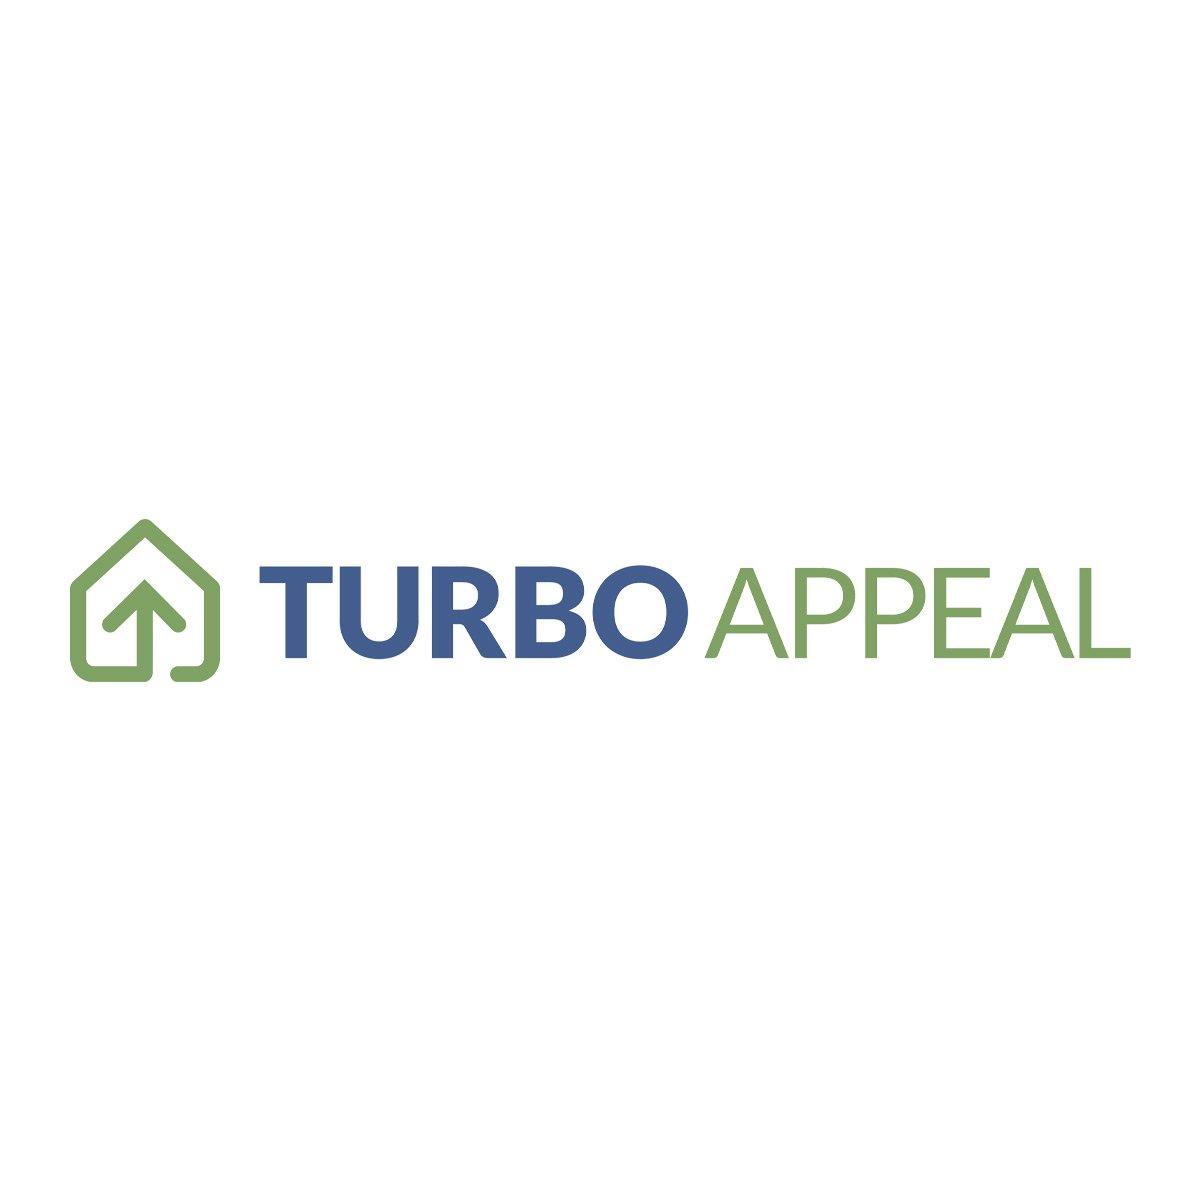 TurboAppeal